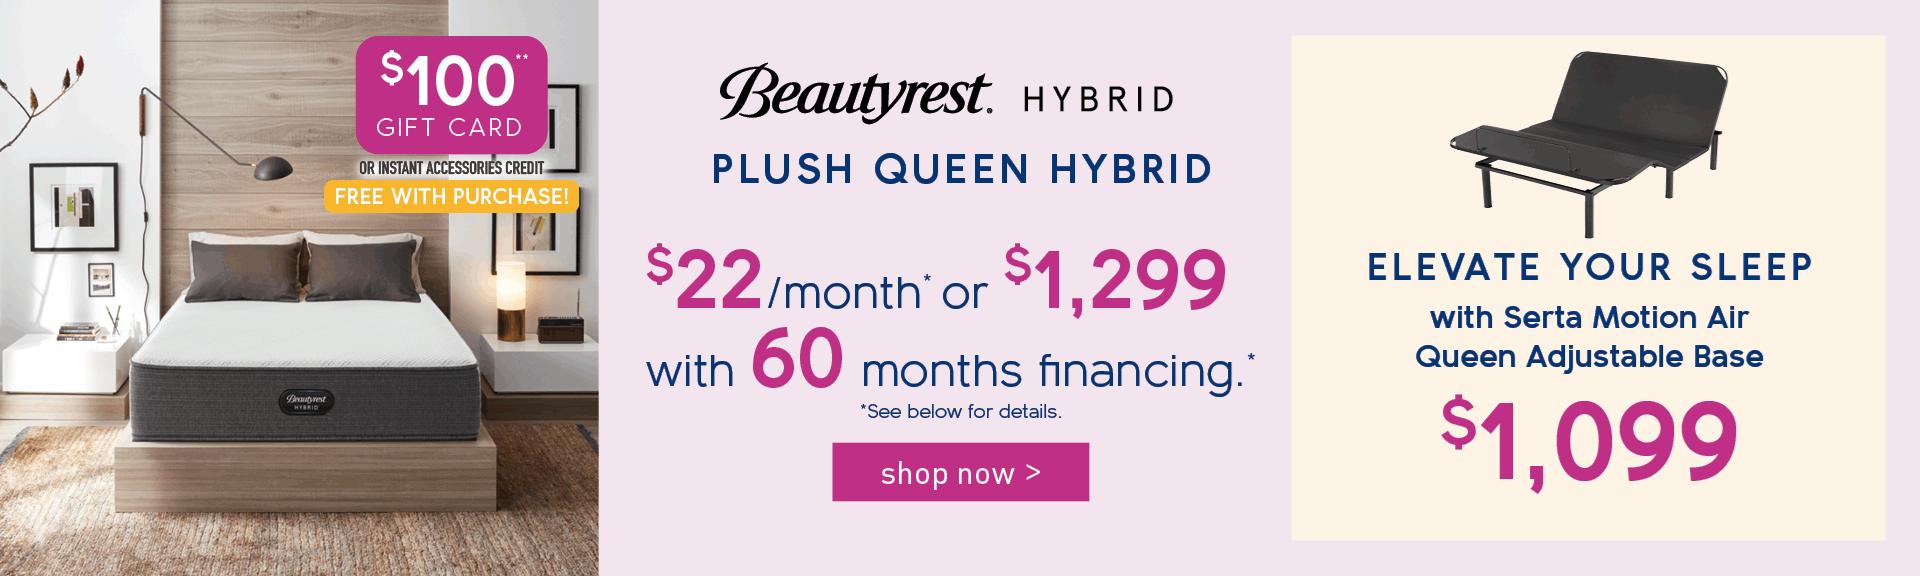 Beautyrest Hybrid